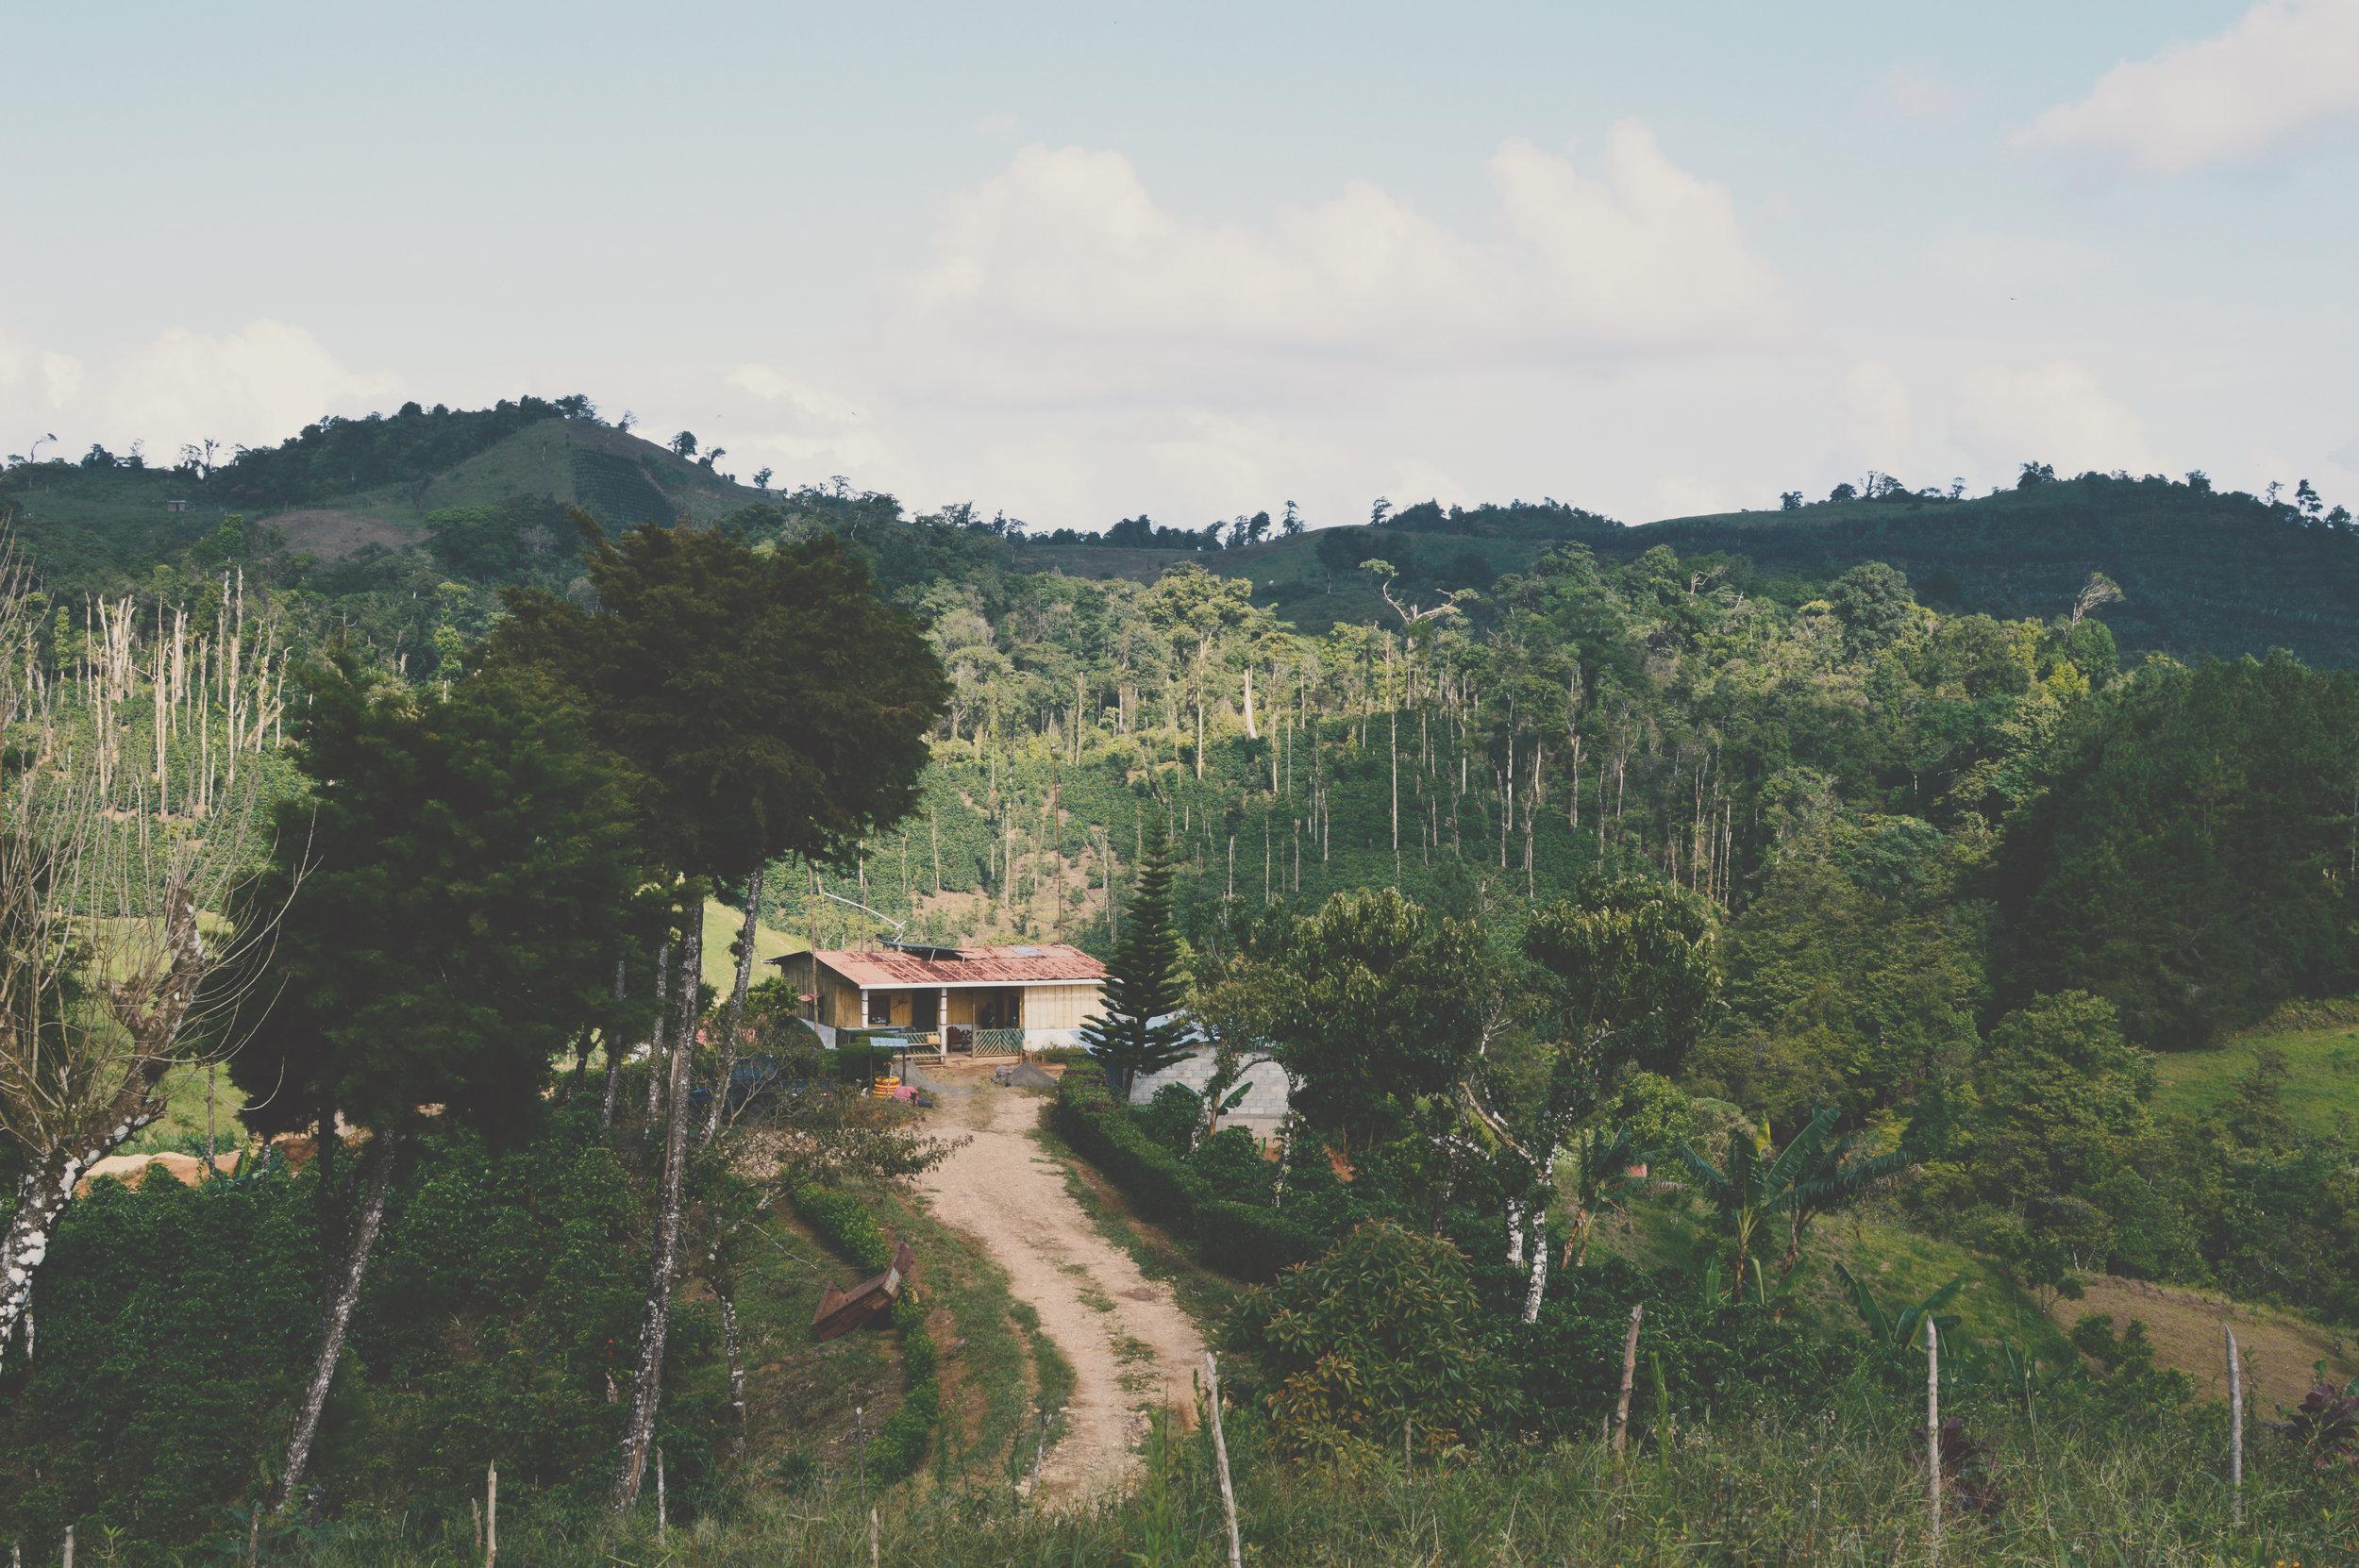 ABOUT THE FARM - FINCA SAN JOSE DE LAS NUBES